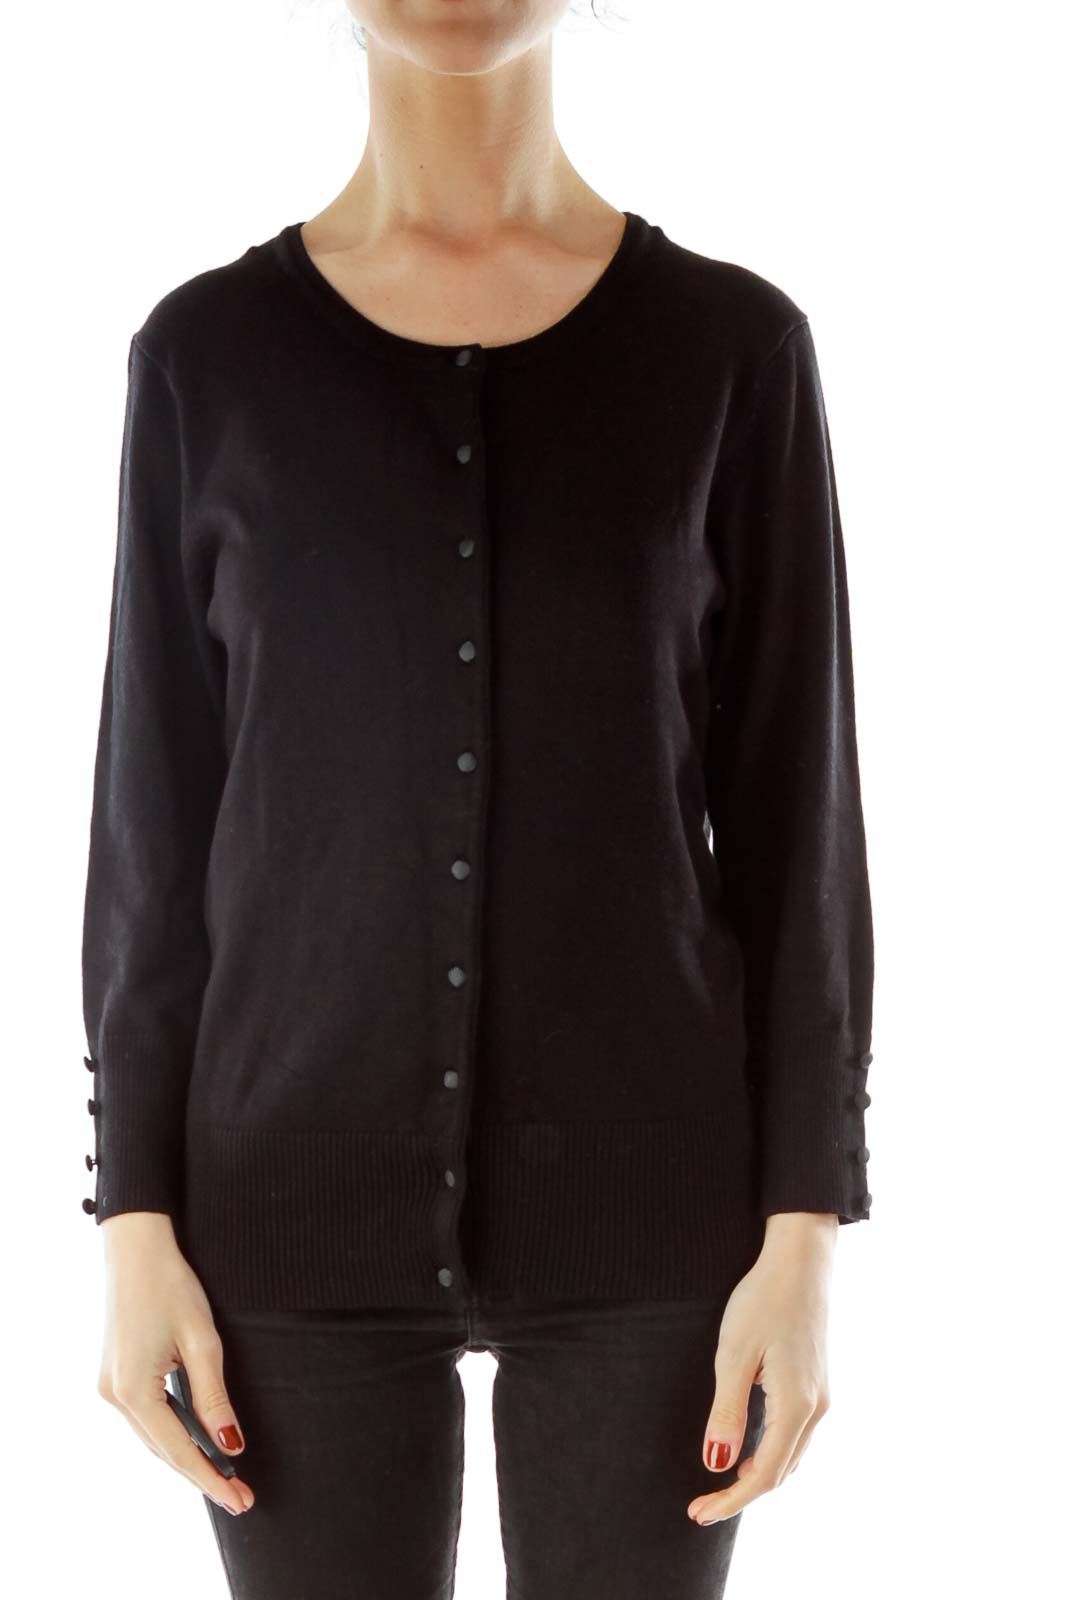 Black Buttoned Cardigan